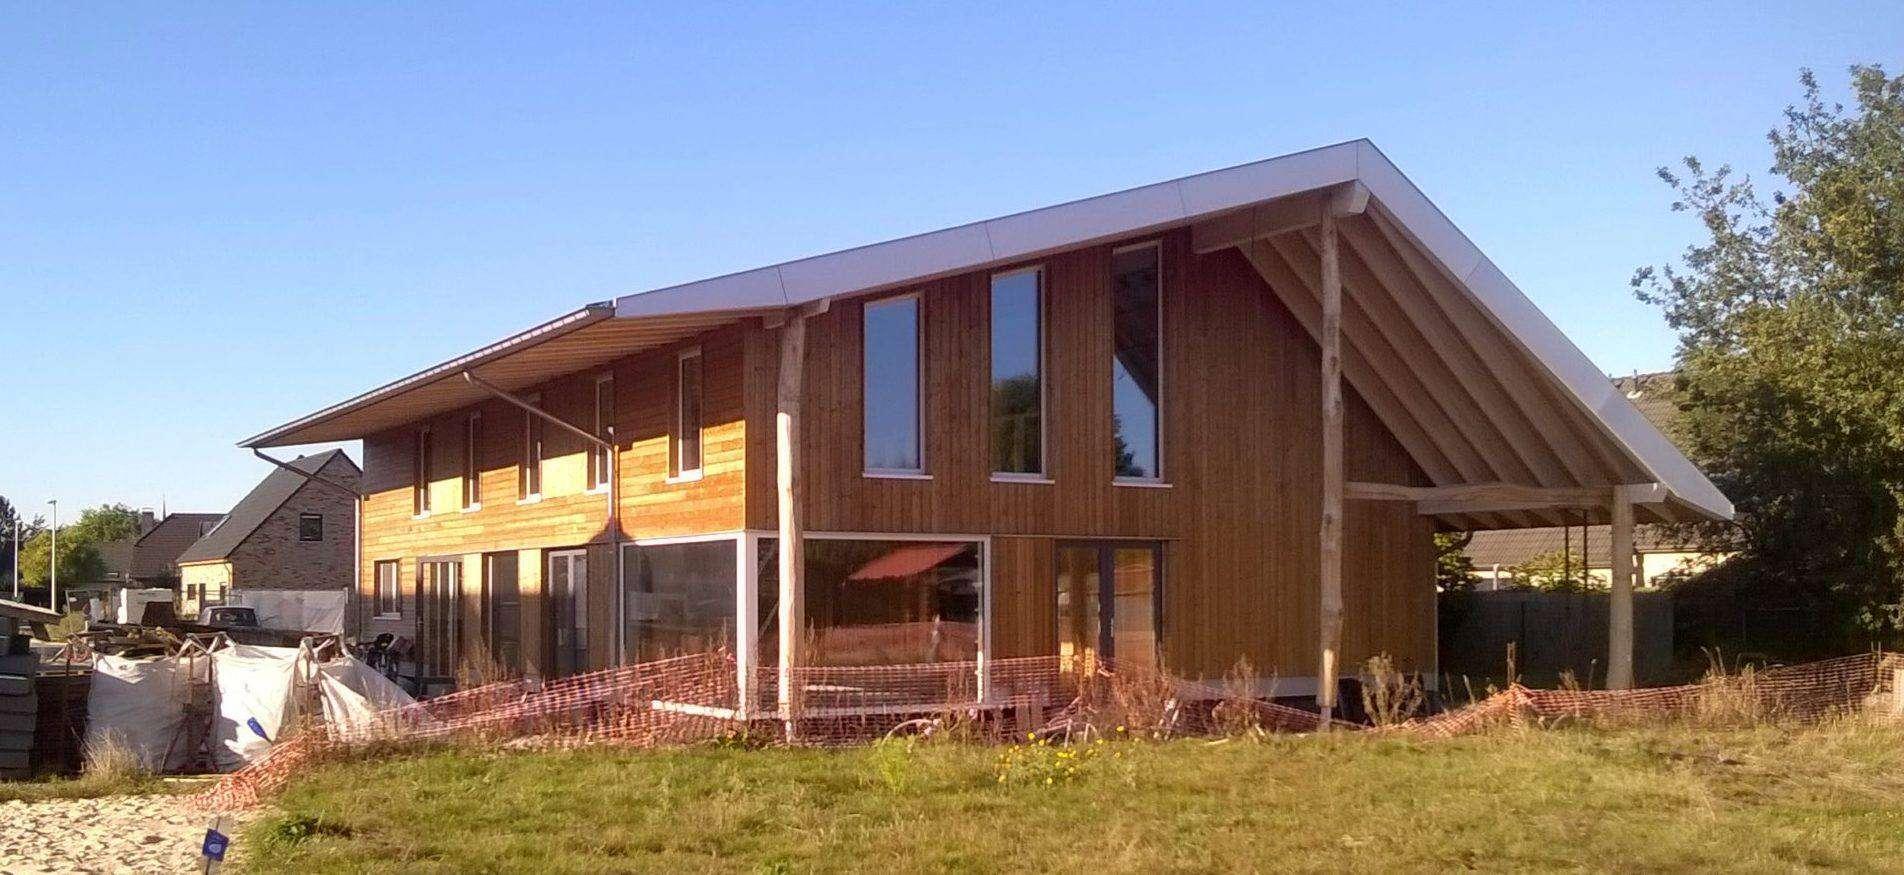 cohousing oostakker <span>2017, oostakker, cohousing, wonen</span>